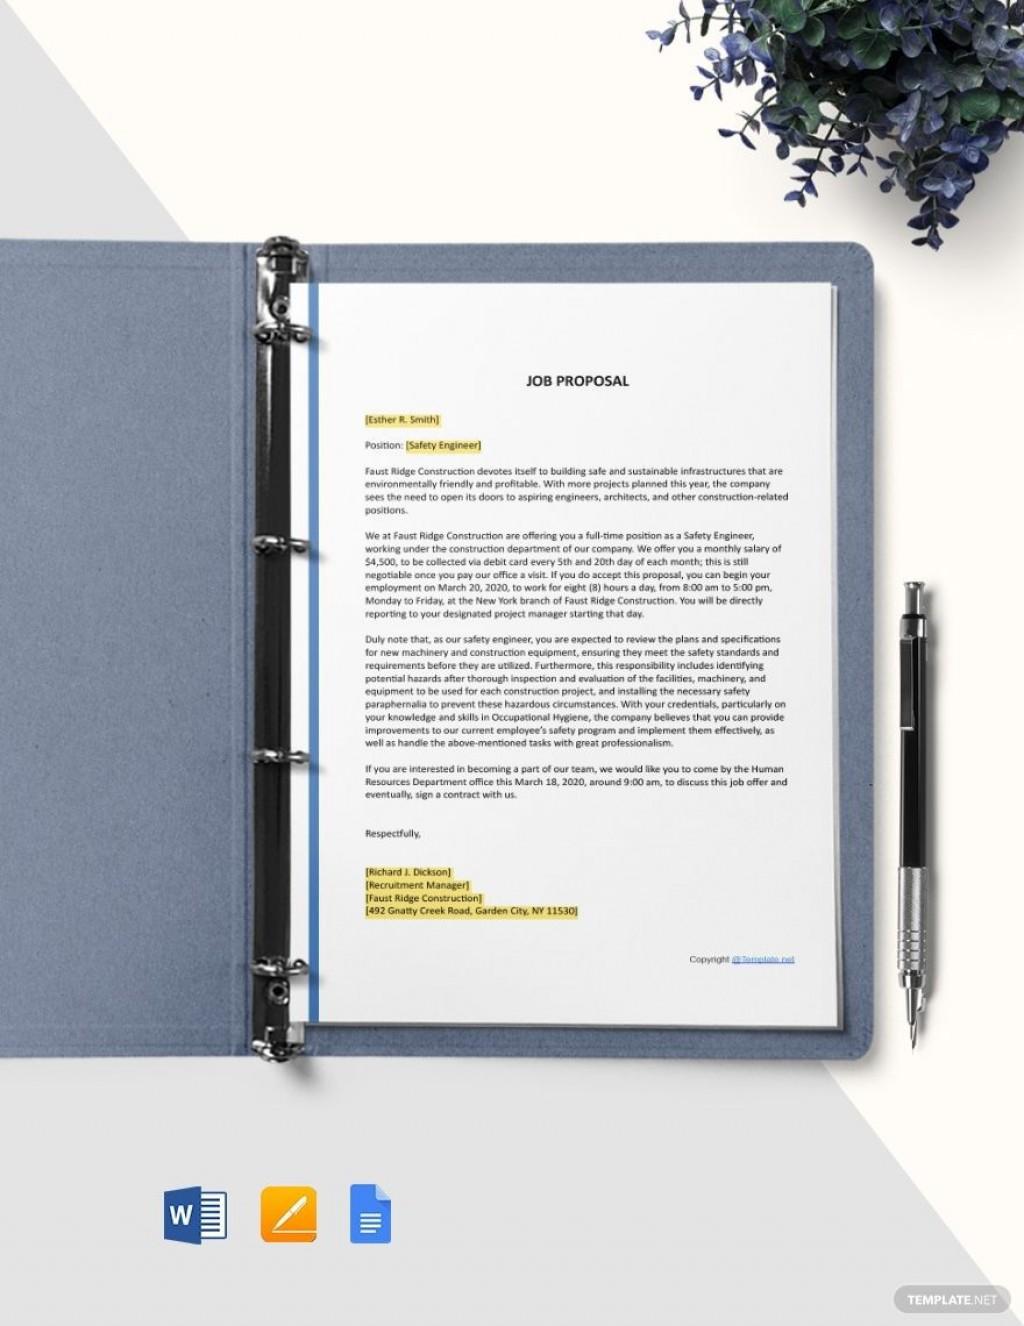 004 Impressive Microsoft Word Job Proposal Template Concept Large